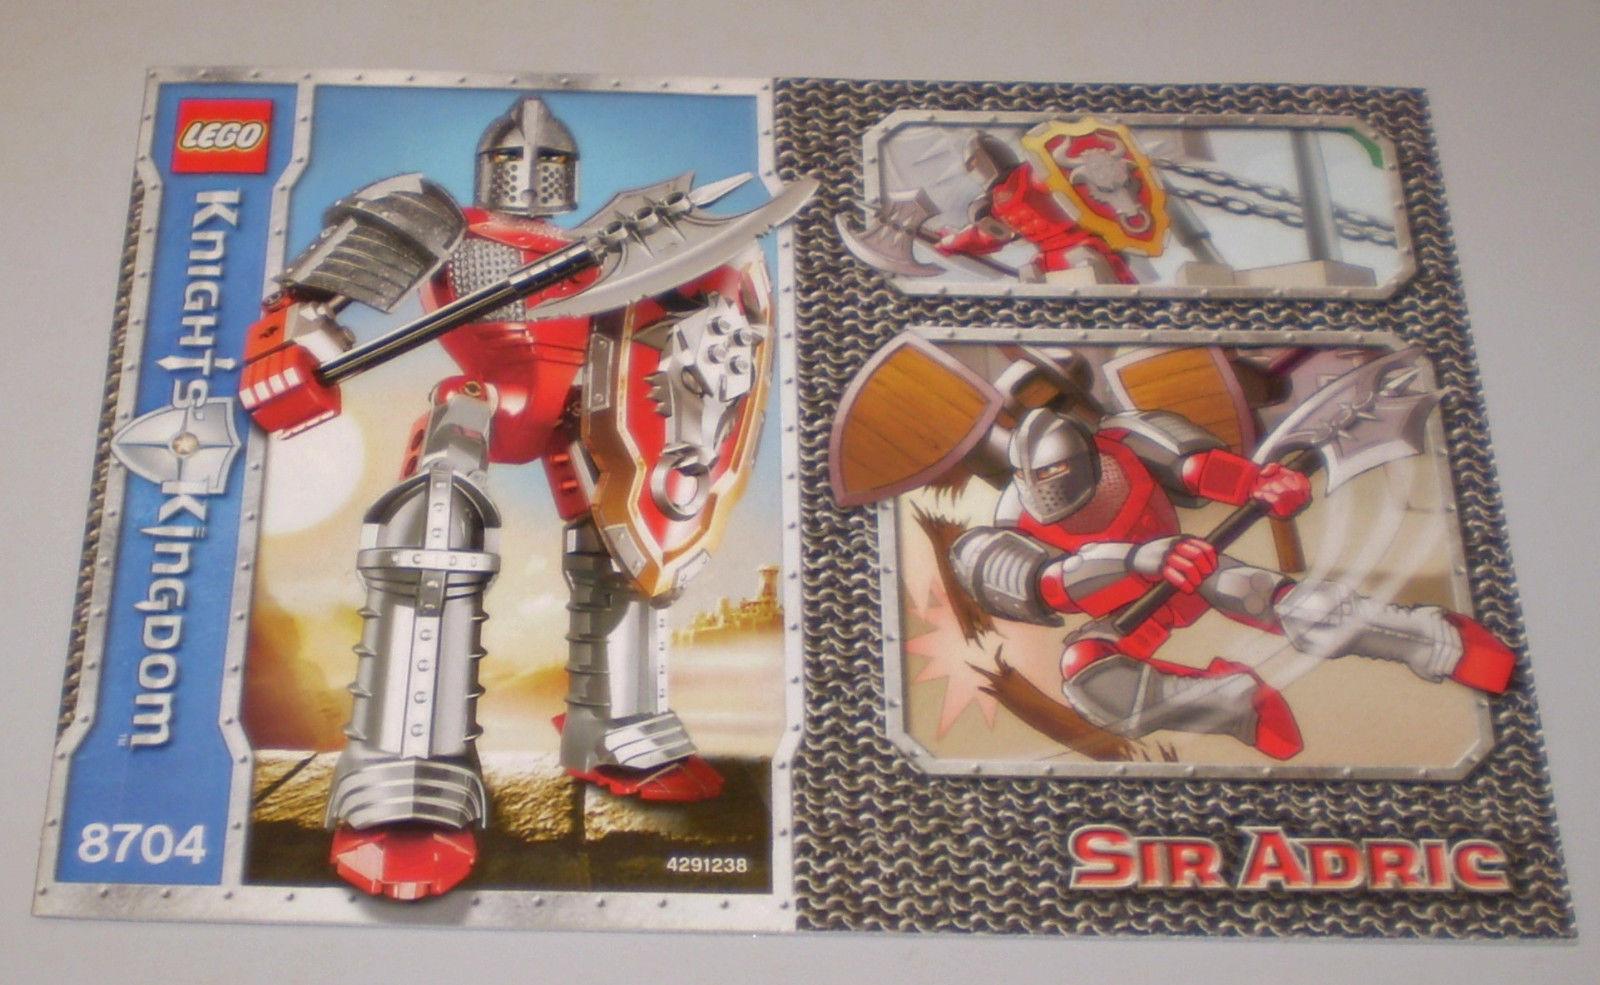 Lego Instruction Manuals Book for BuildingStar Wars Creator Minecraft Marvel